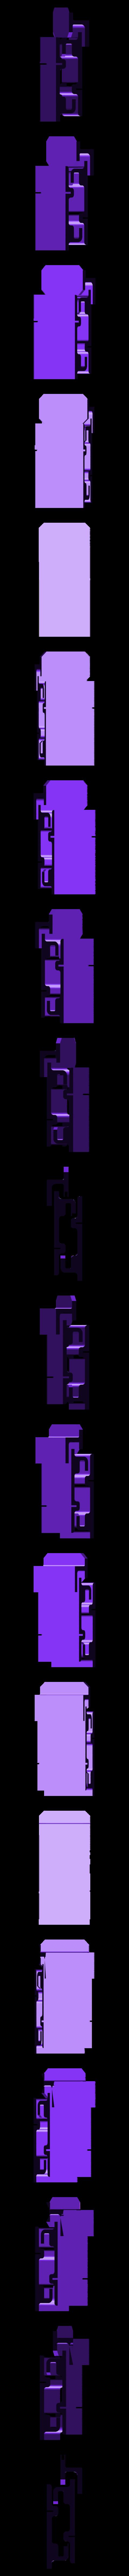 set_5mm.stl Download free STL file FlashForge Adventurer3 Mirror Hook • 3D printing template, CyberCyclist